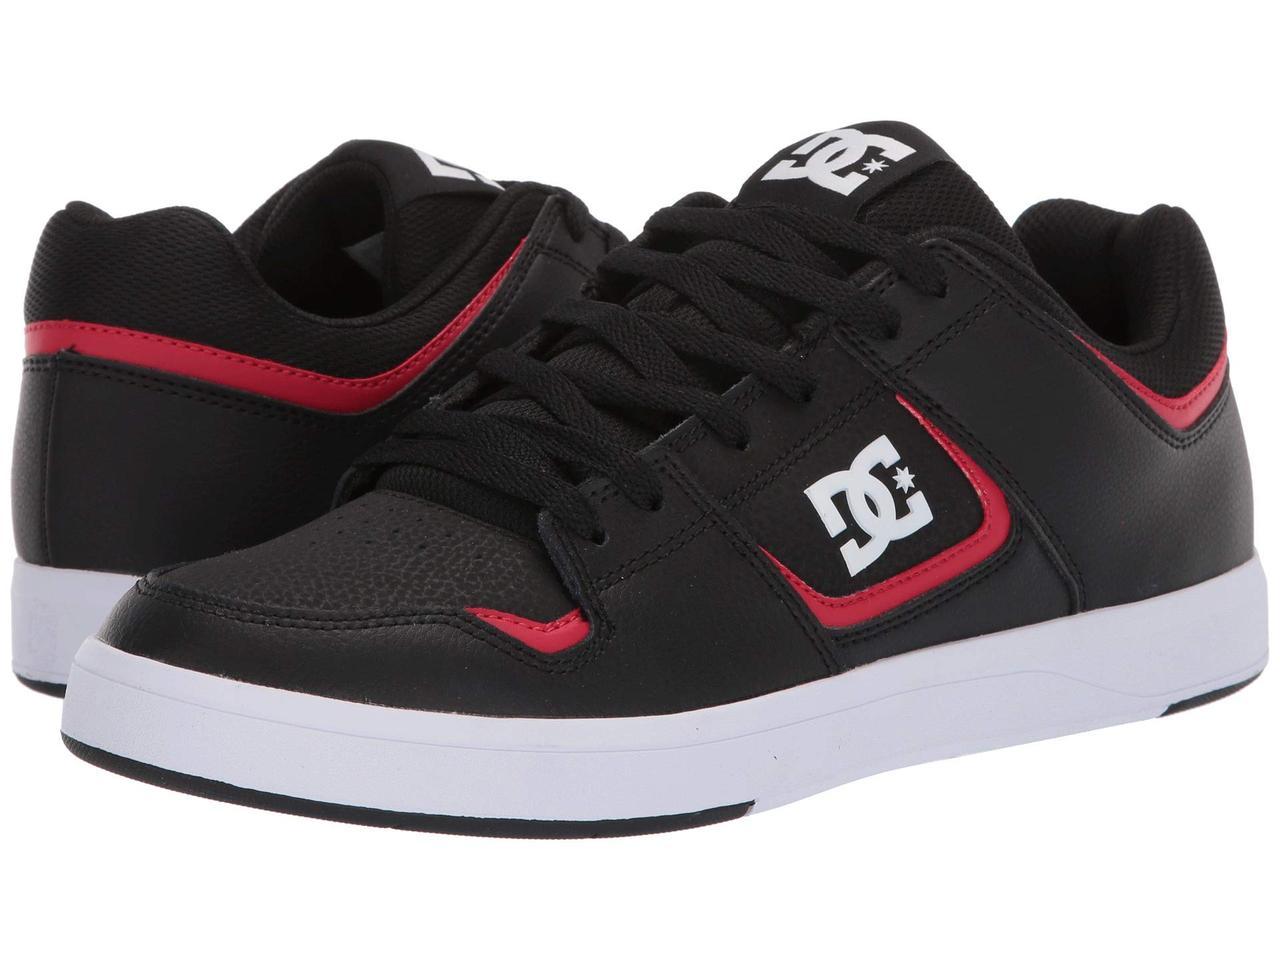 c5c08be49 Кроссовки/Кеды (Оригинал) DC DC Shoes Cure Black/Red, цена 2 020 грн ...